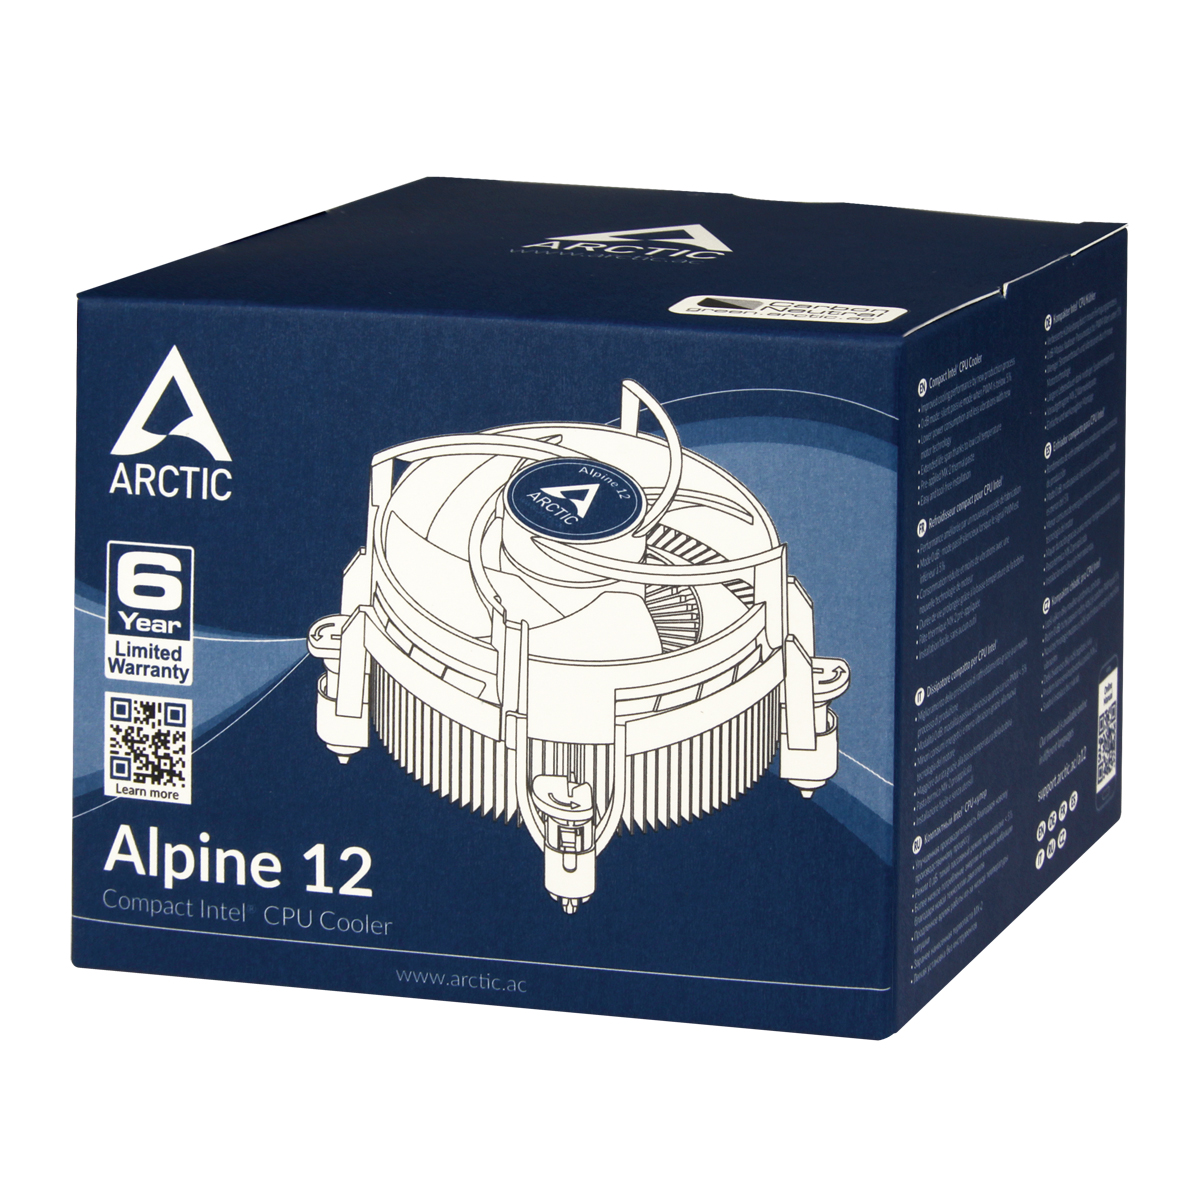 Kompakter Intel CPU-Kühler ARCTIC Alpine 12 Produktverpackung Vorderansicht